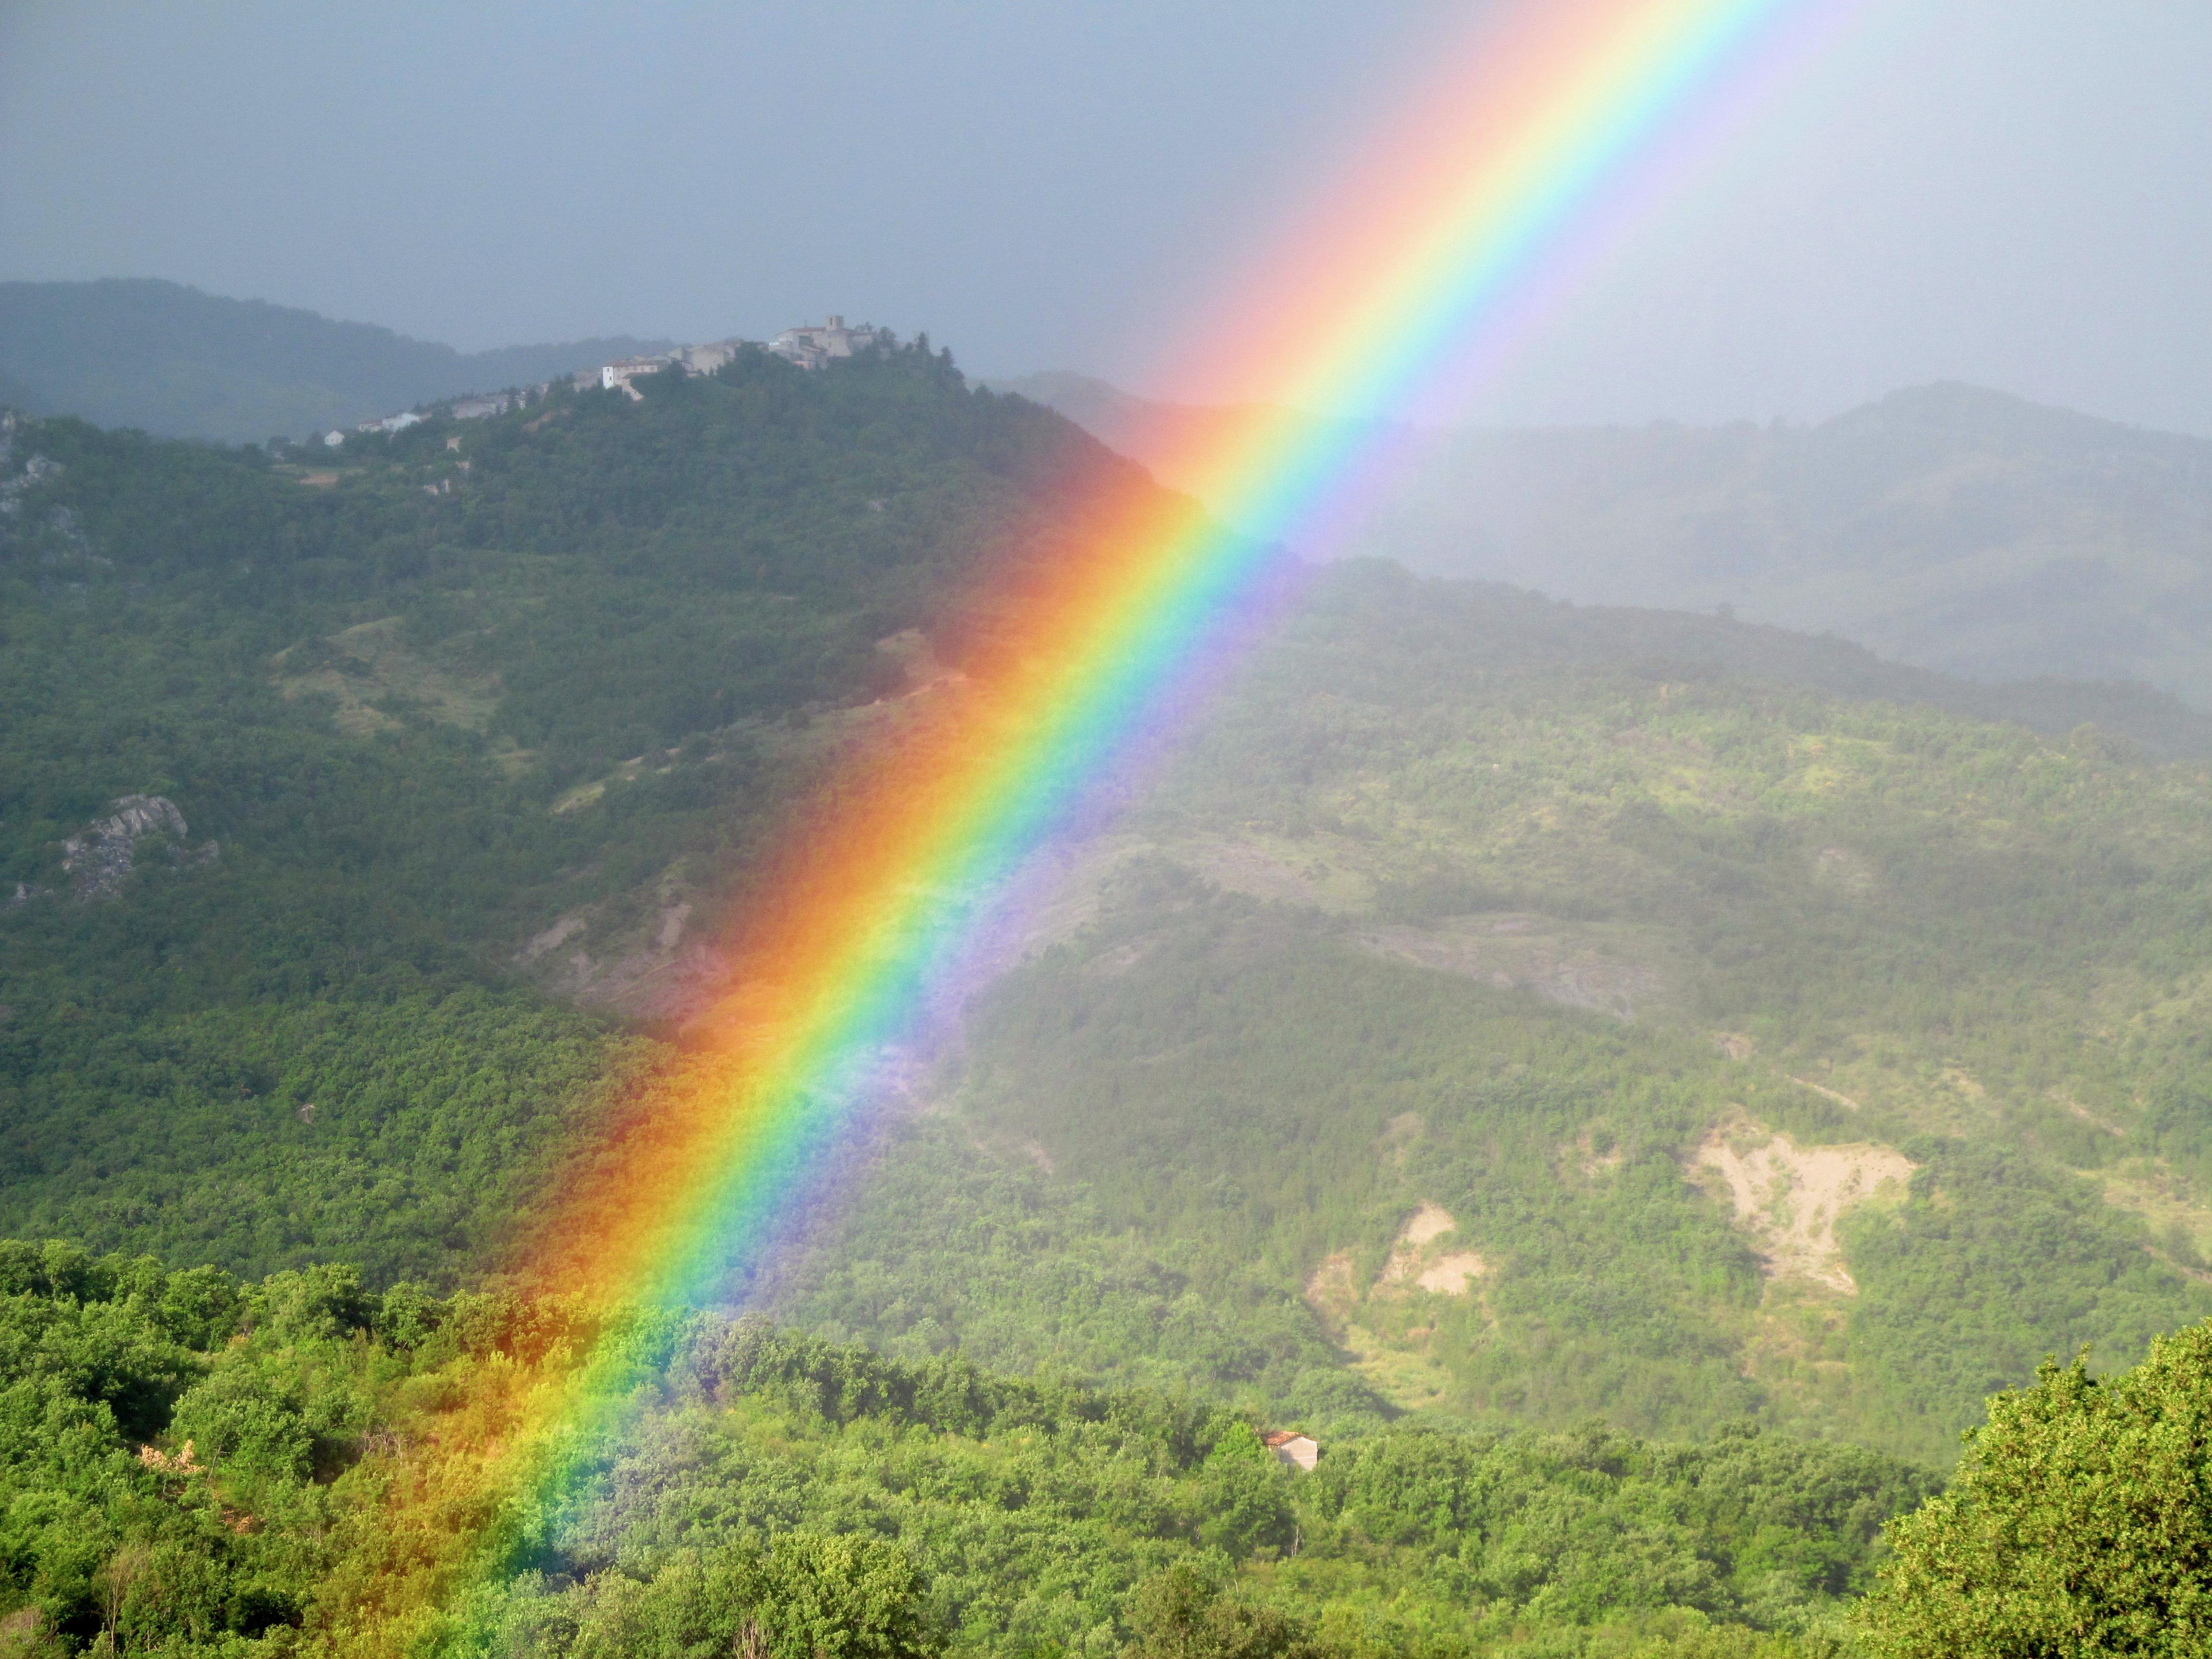 Valley under the rainbow